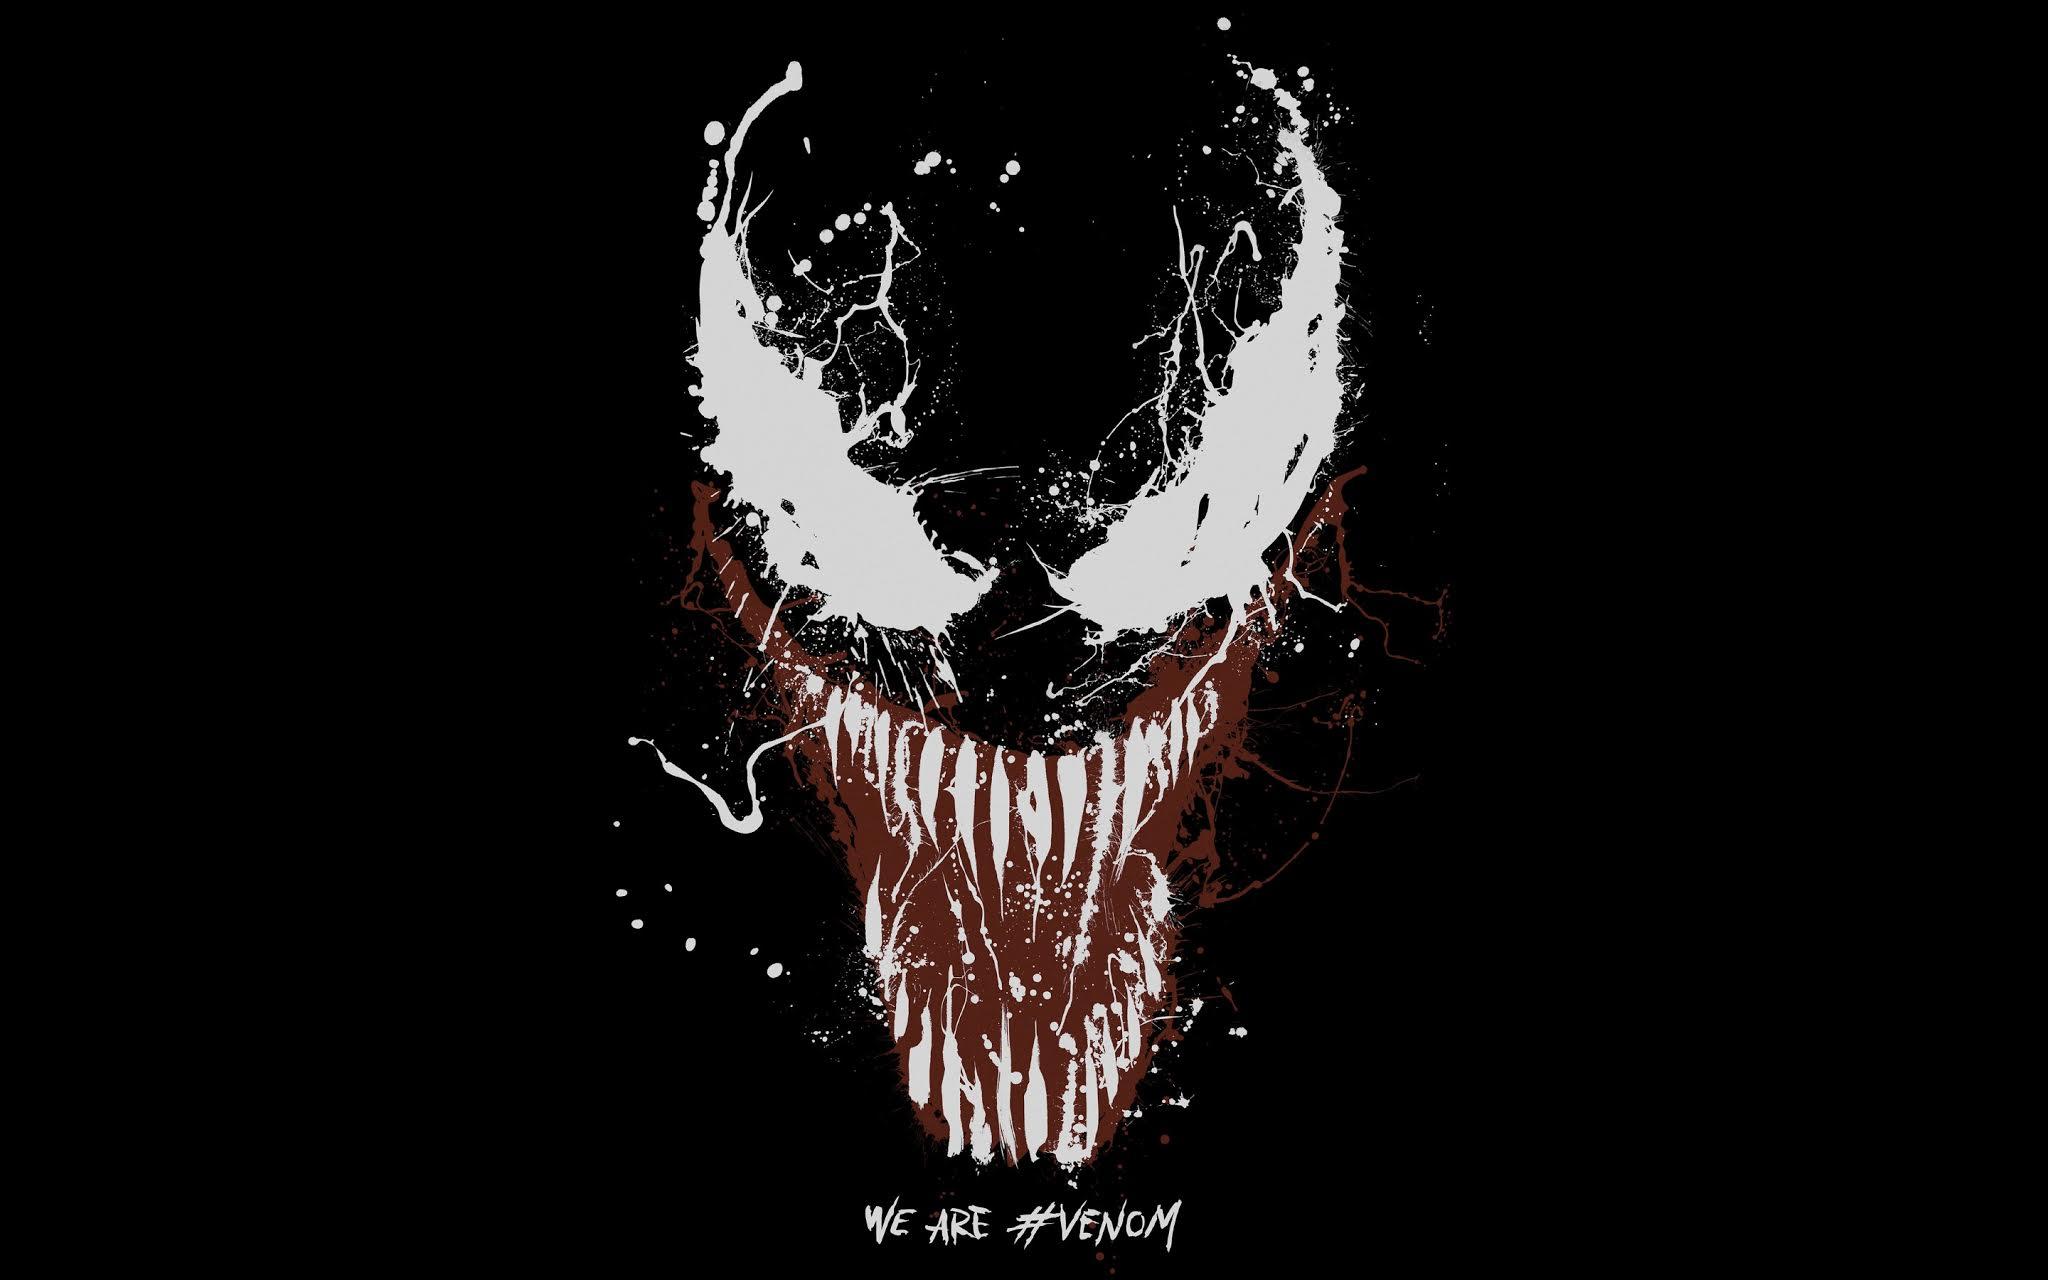 Plano De Fundo Preto Venom Hd